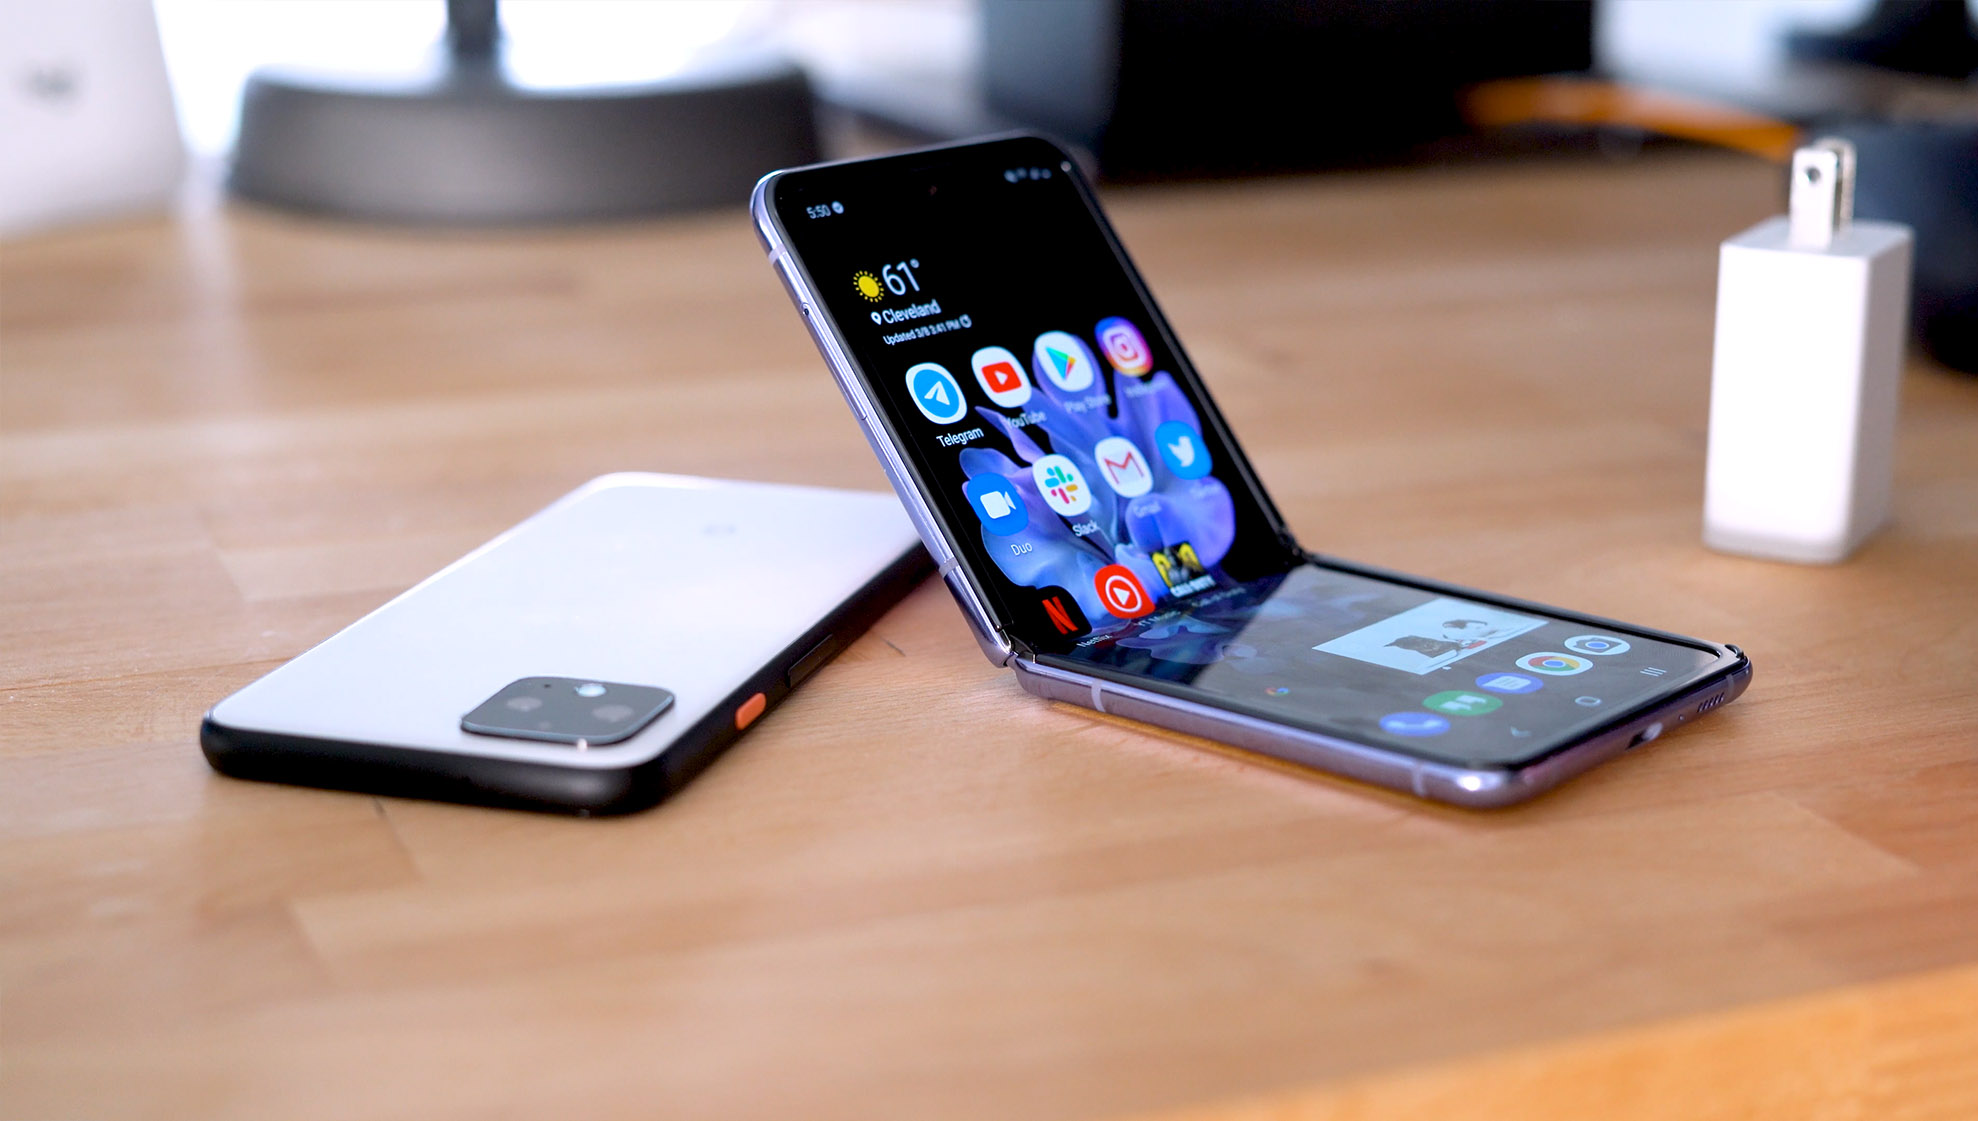 Harga Samsung Galaxy Z Flip Di Tahun 2021 Terbaru